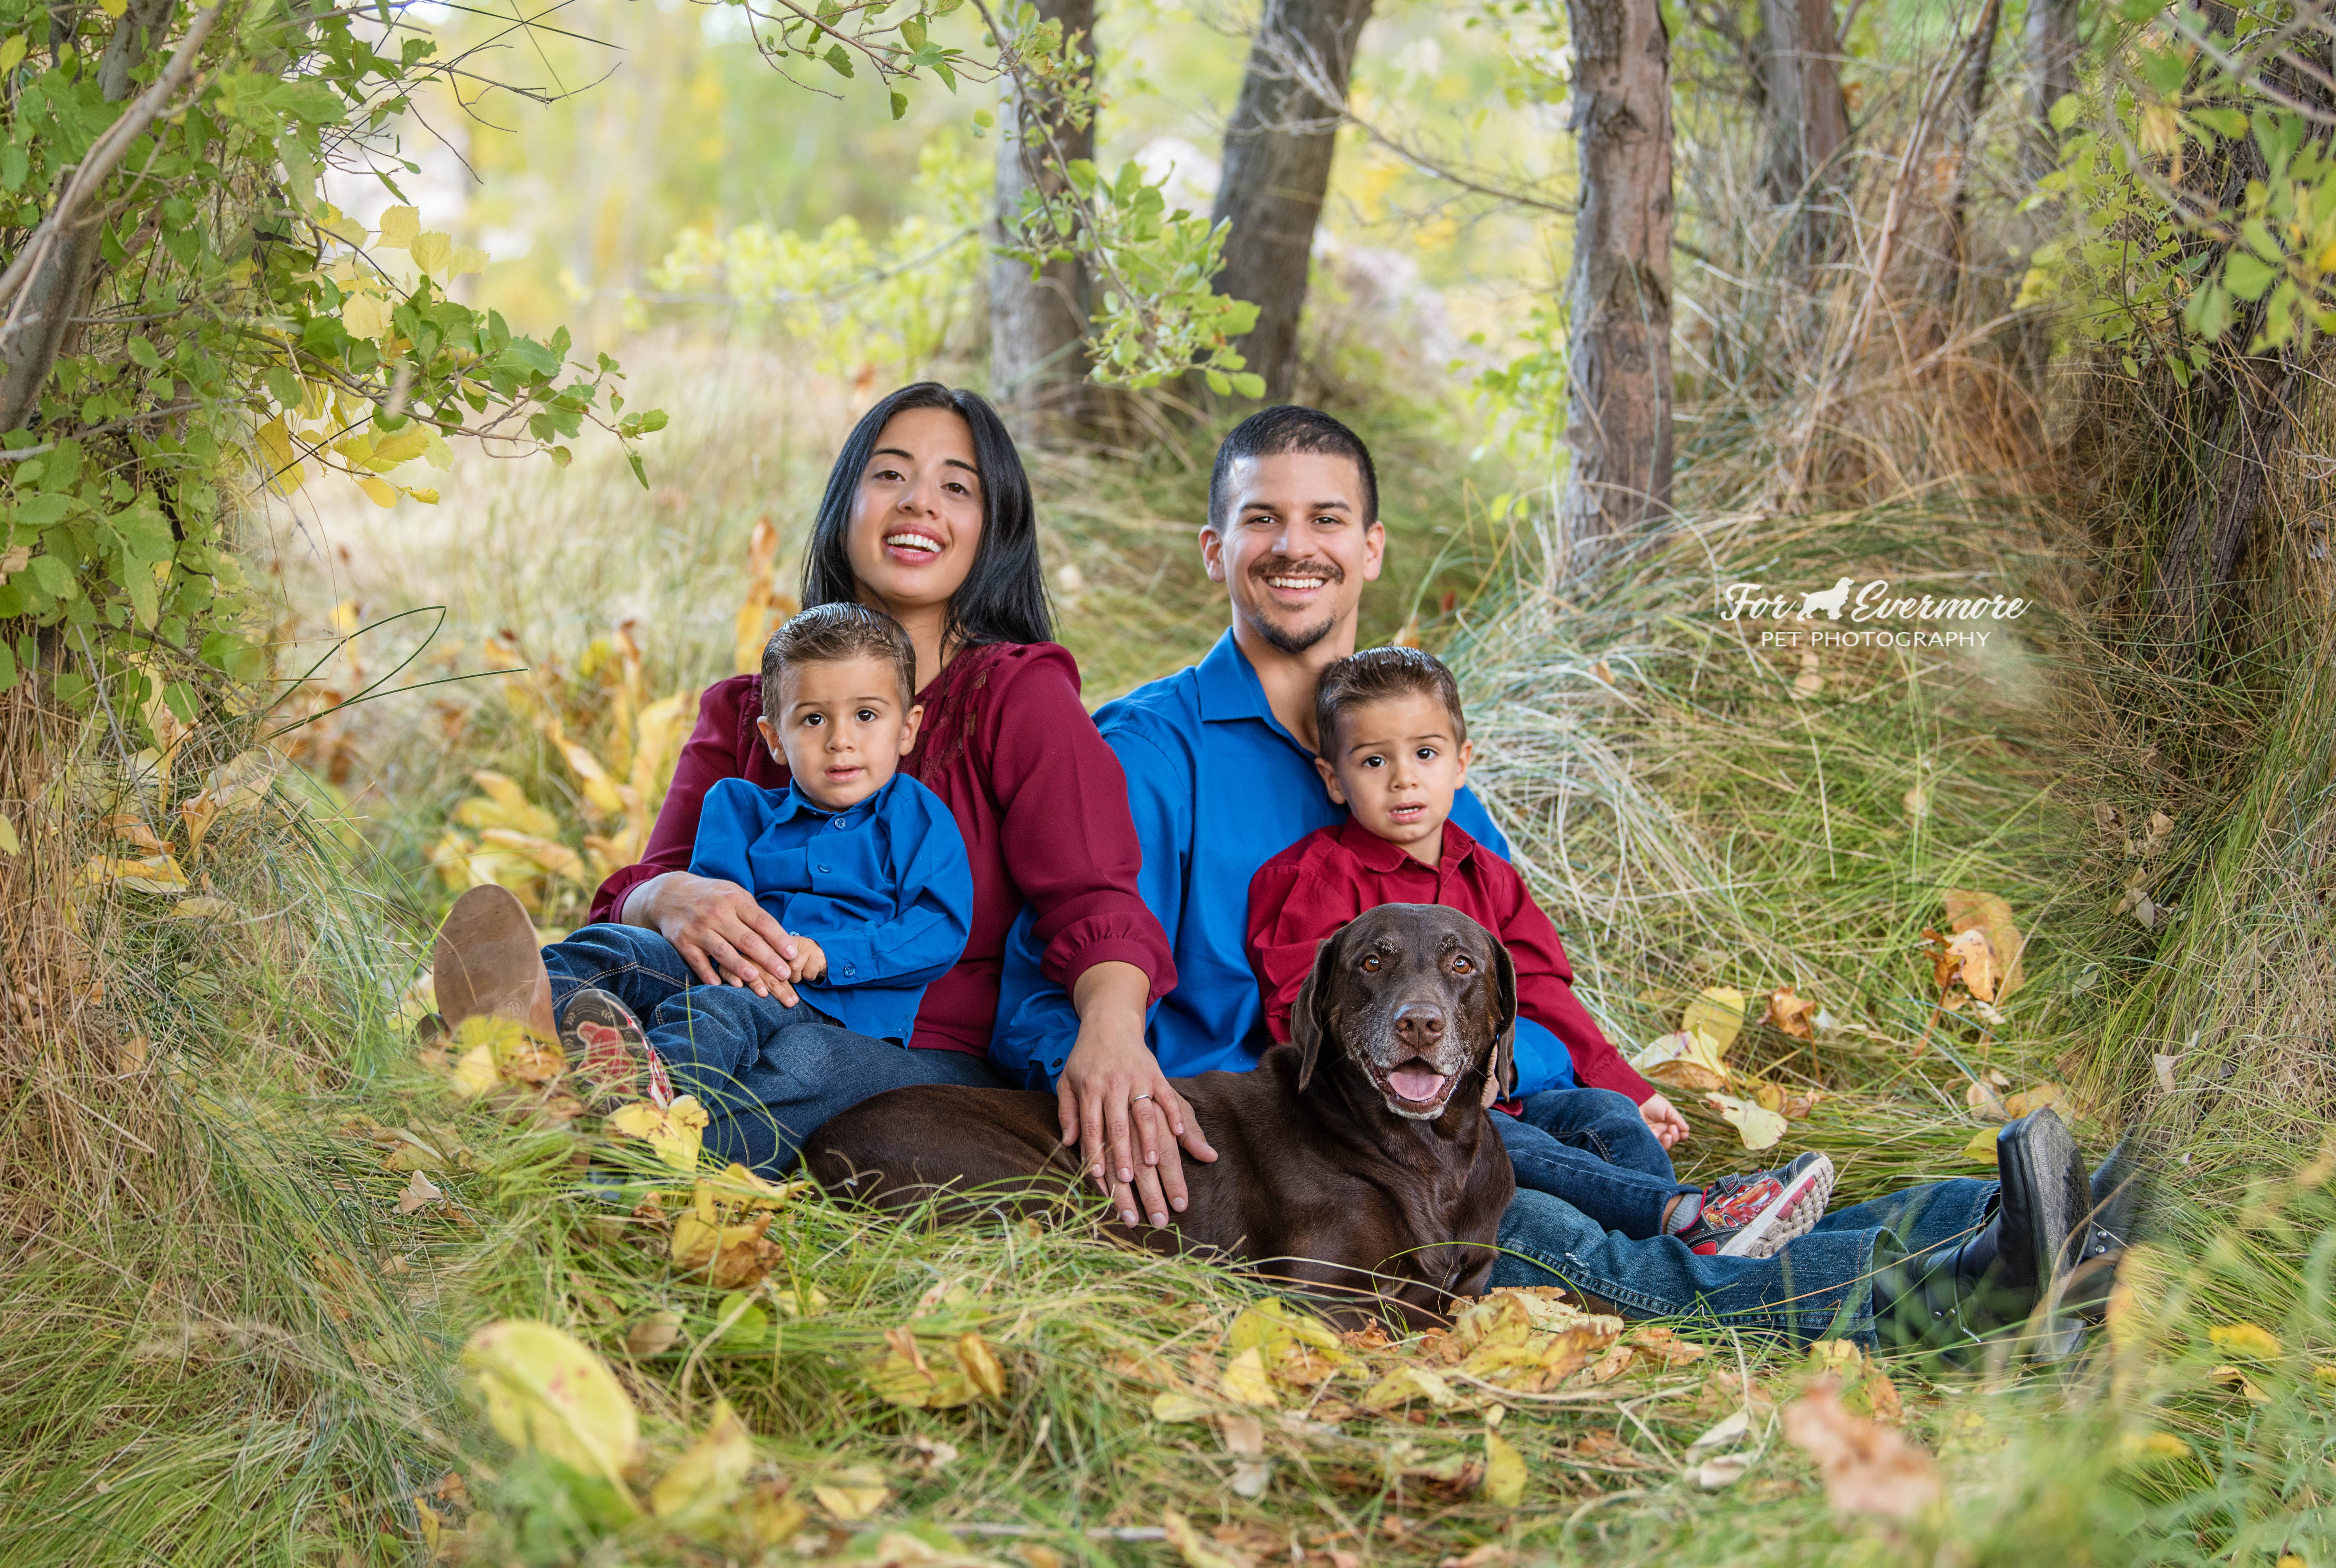 Gunnar's family